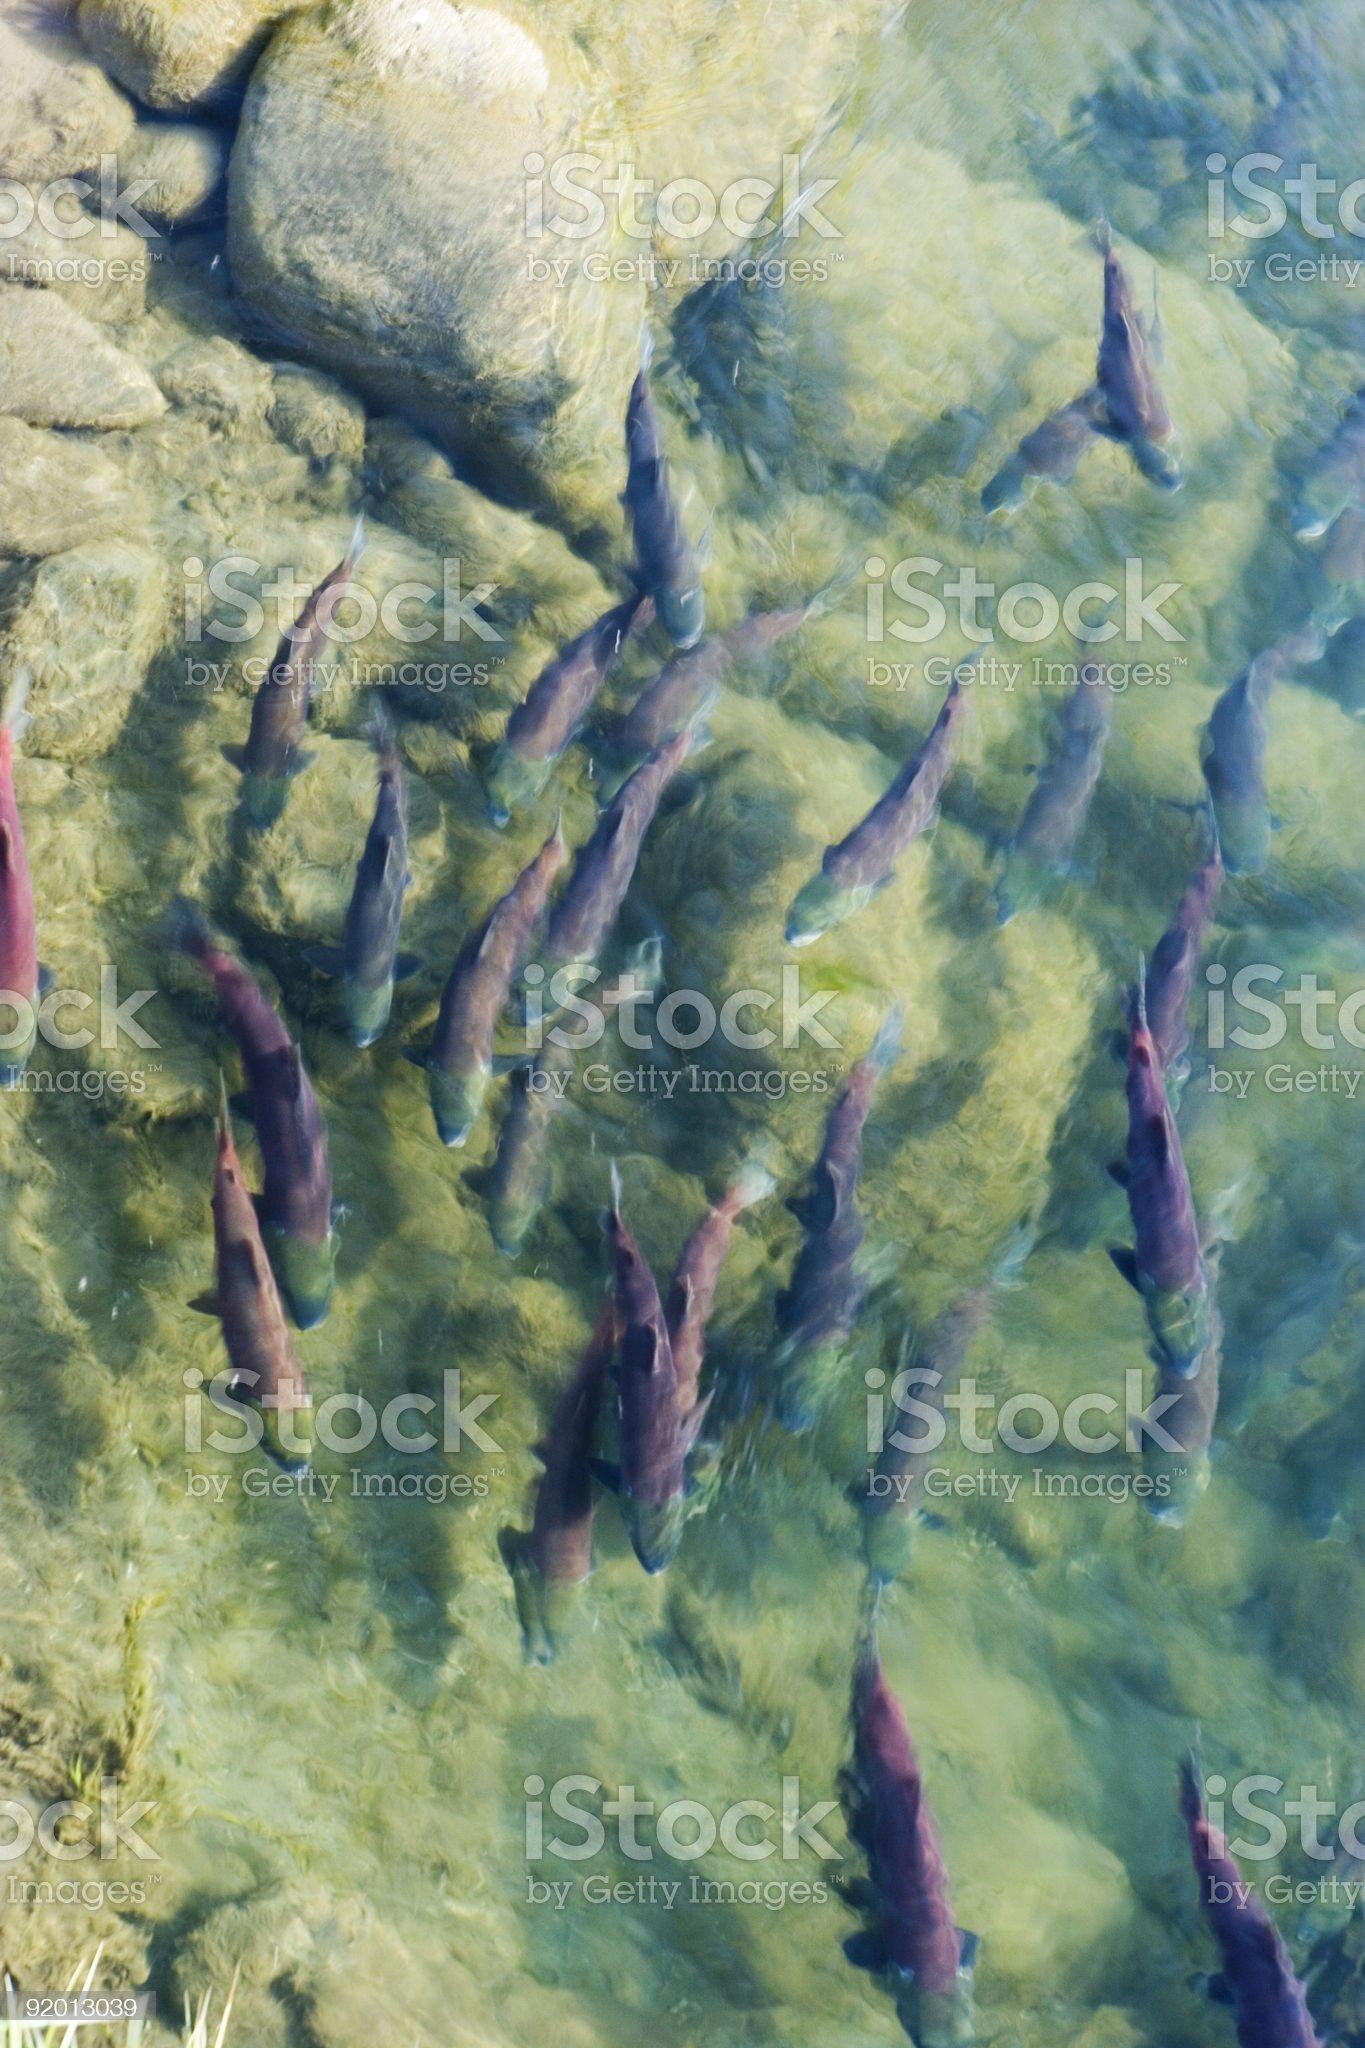 Sockeye salmon at spawning grownd royalty-free stock photo